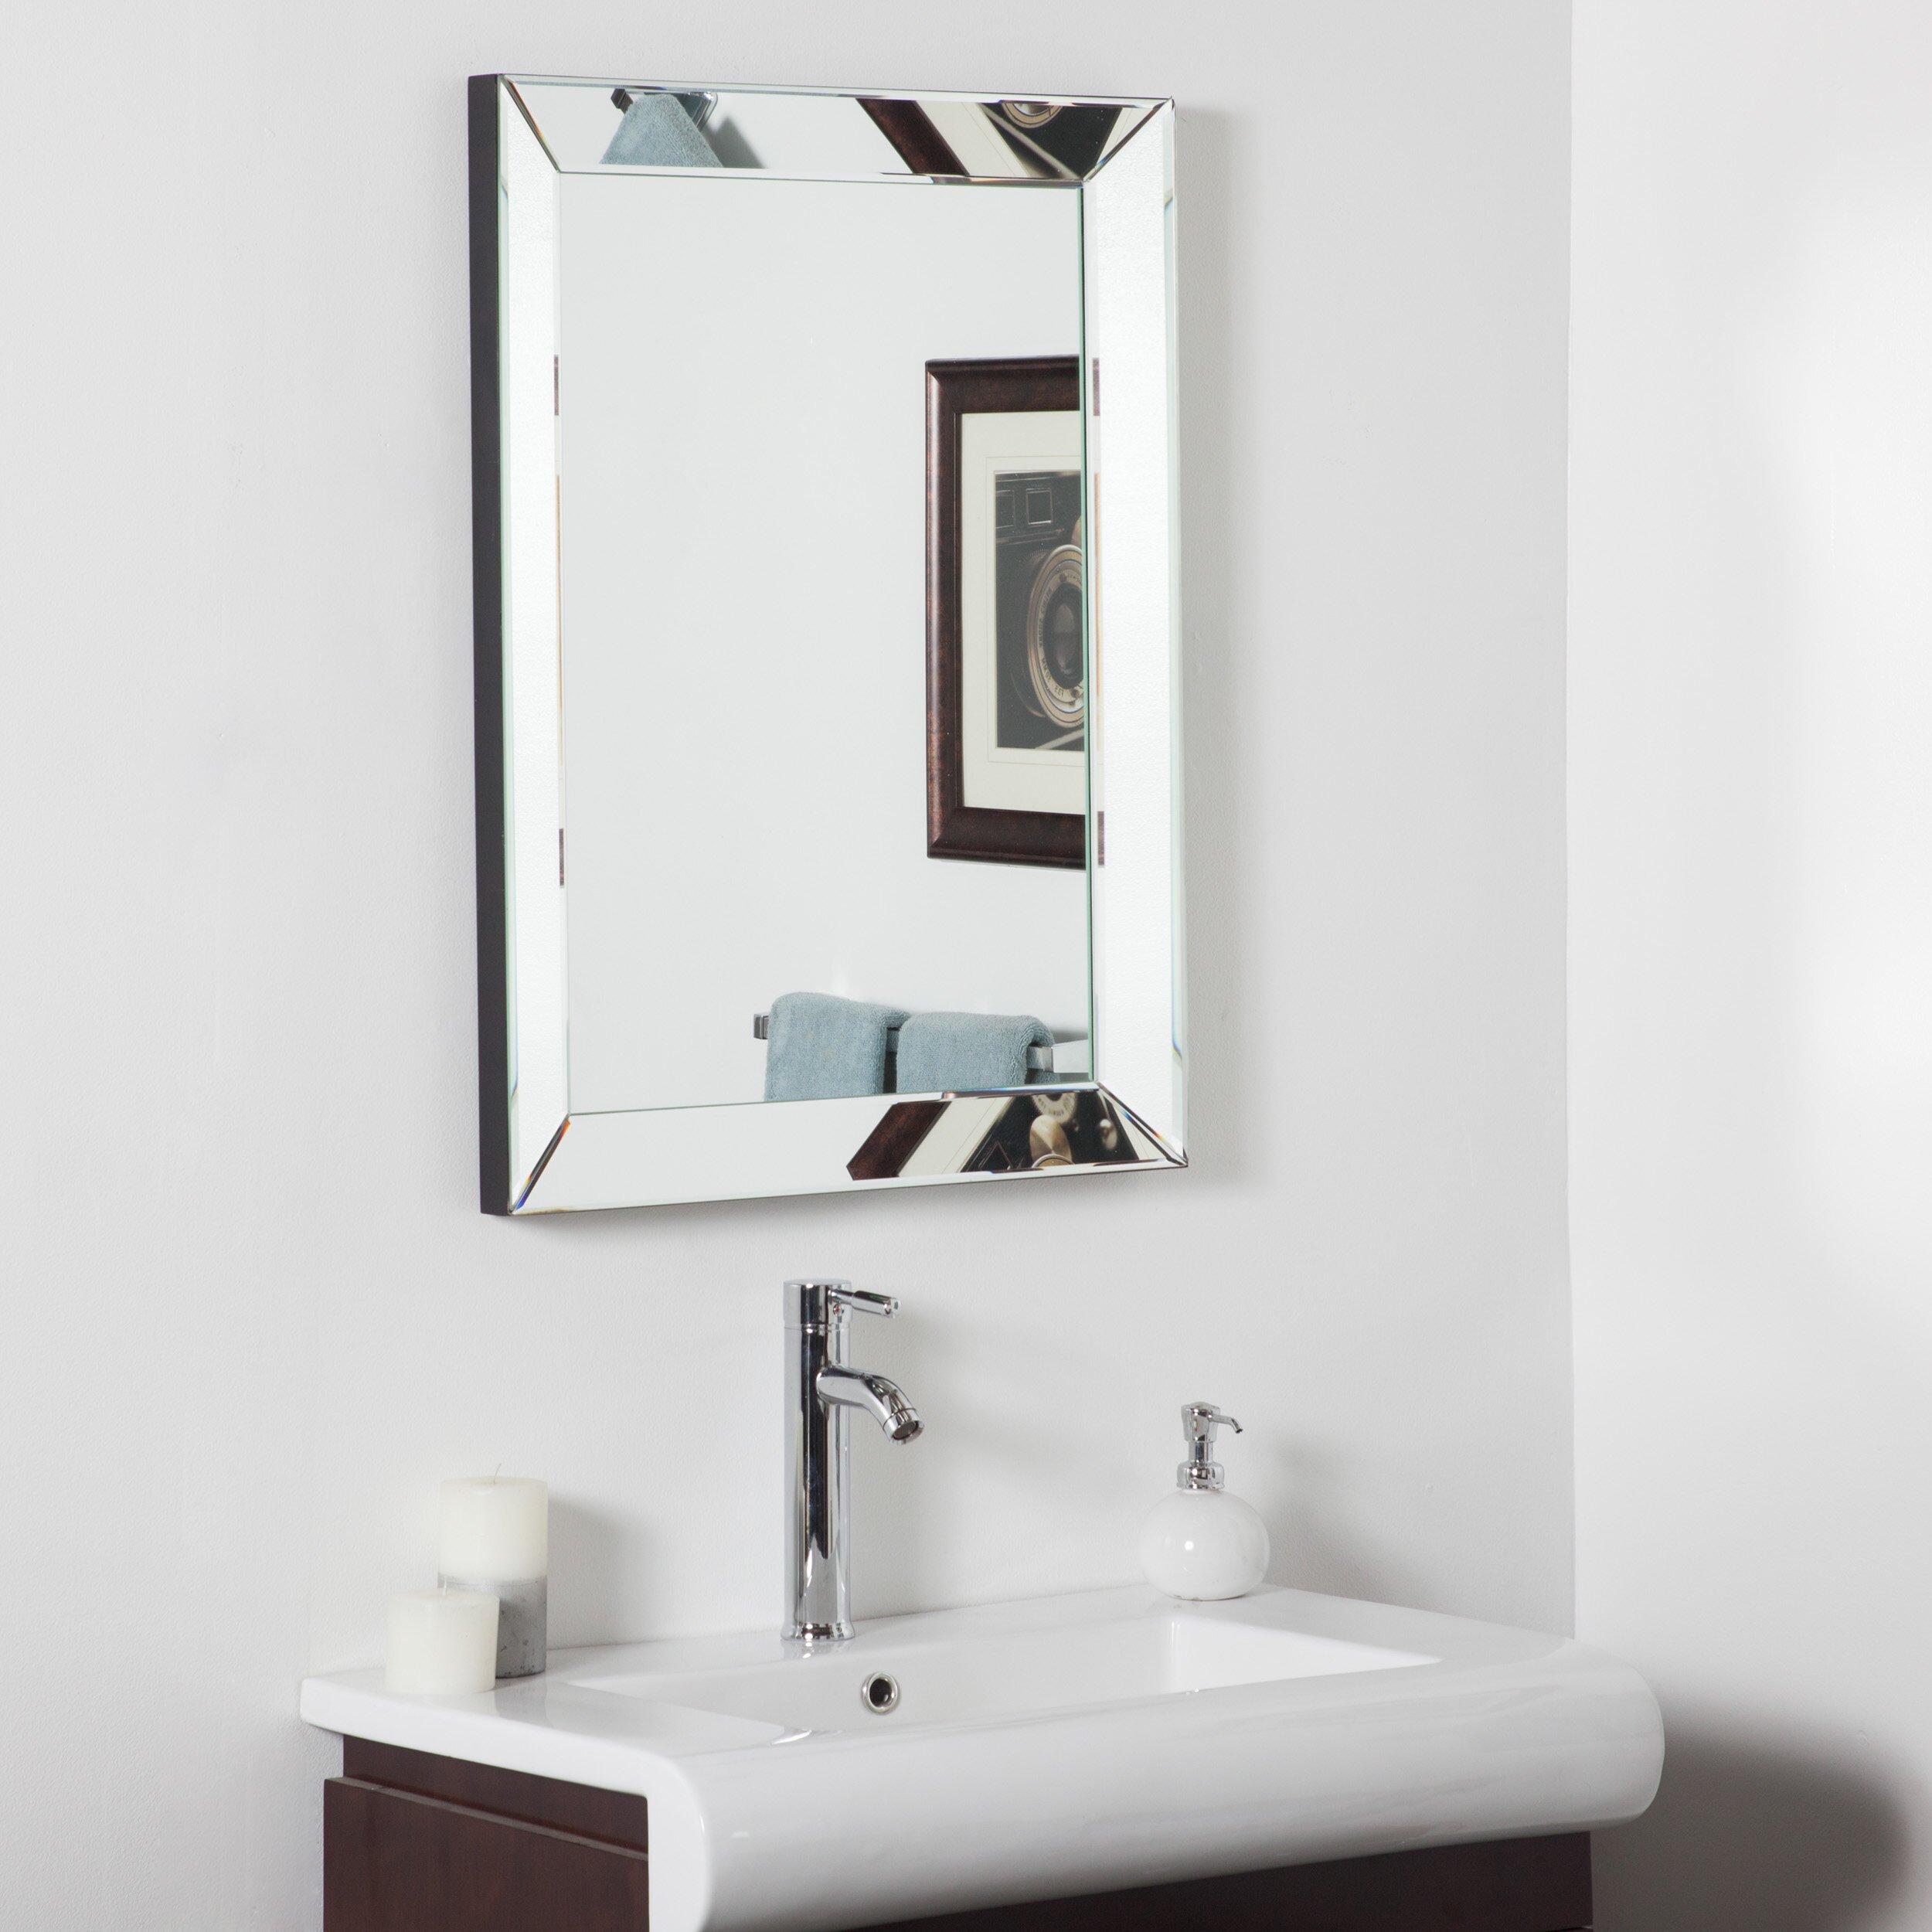 Decor wonderland mirror framed wall mirror reviews wayfair for Master bathroom mirror designs